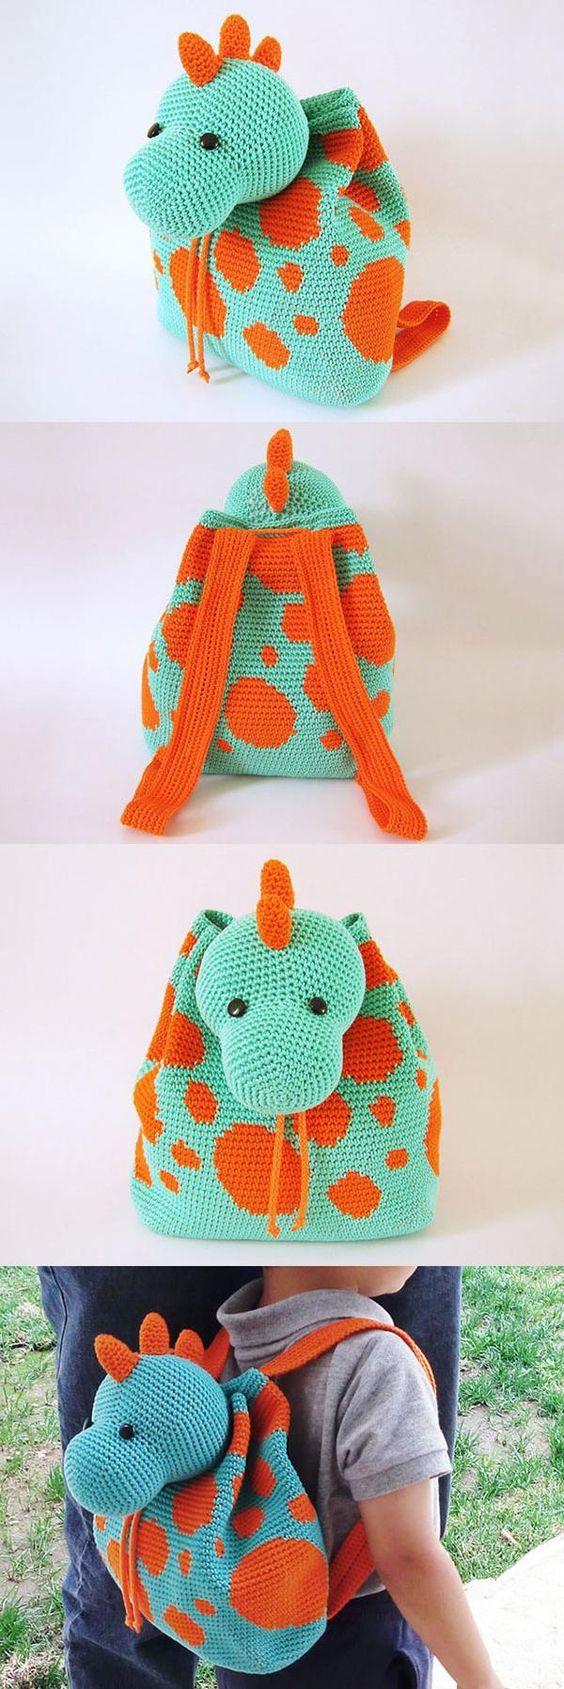 Dino Backpack Crochet Pattern: